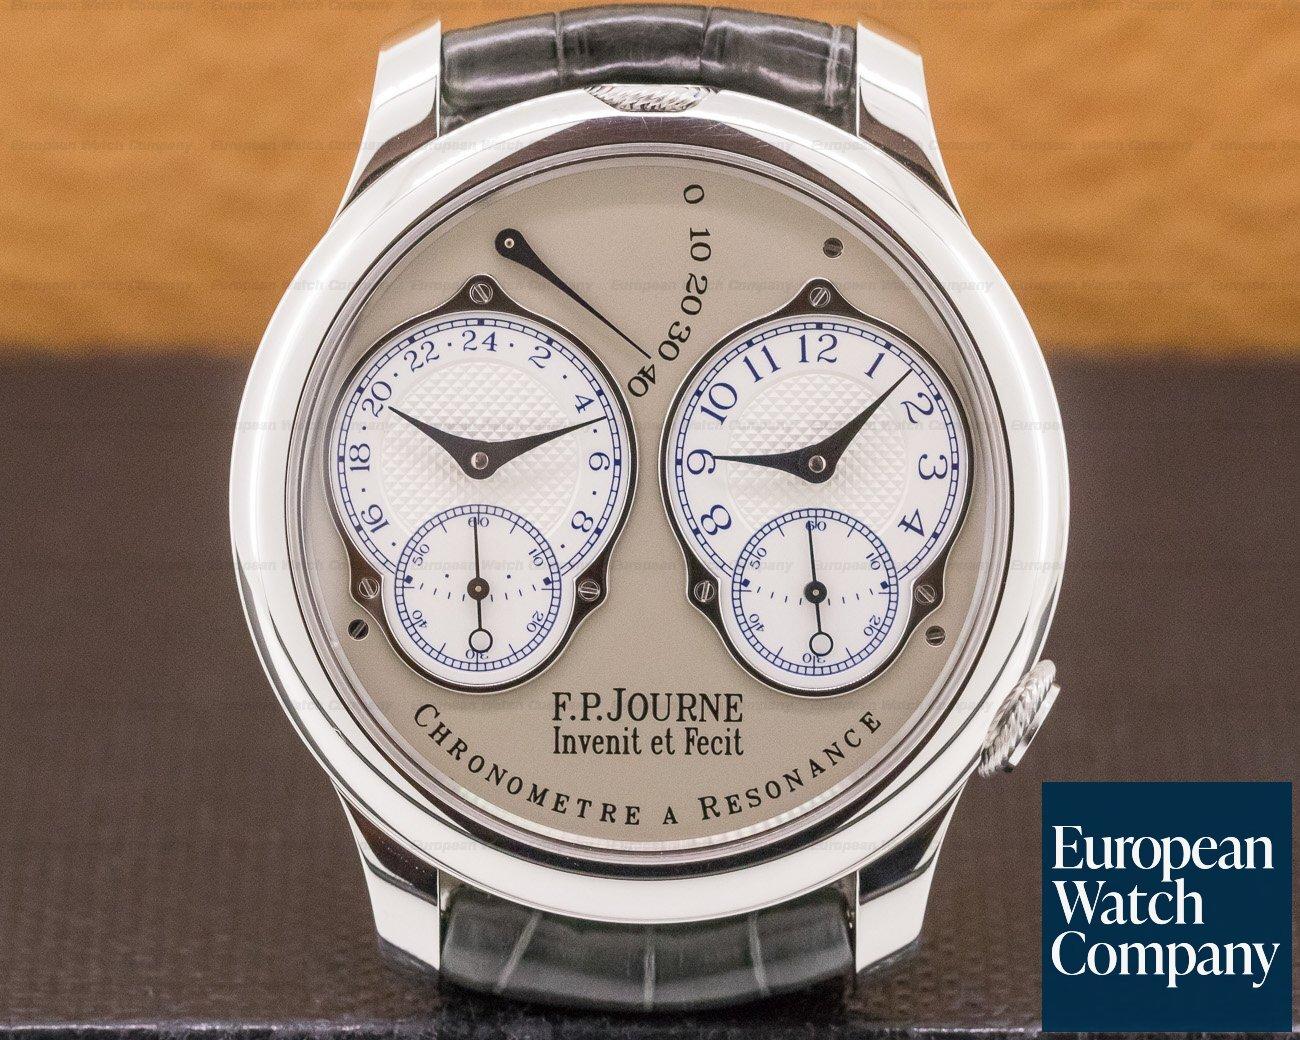 F. P. Journe Chronometre Resonance Fi Chronometre Resonance Platinum Silver Dial 40MM FINAL EDITION